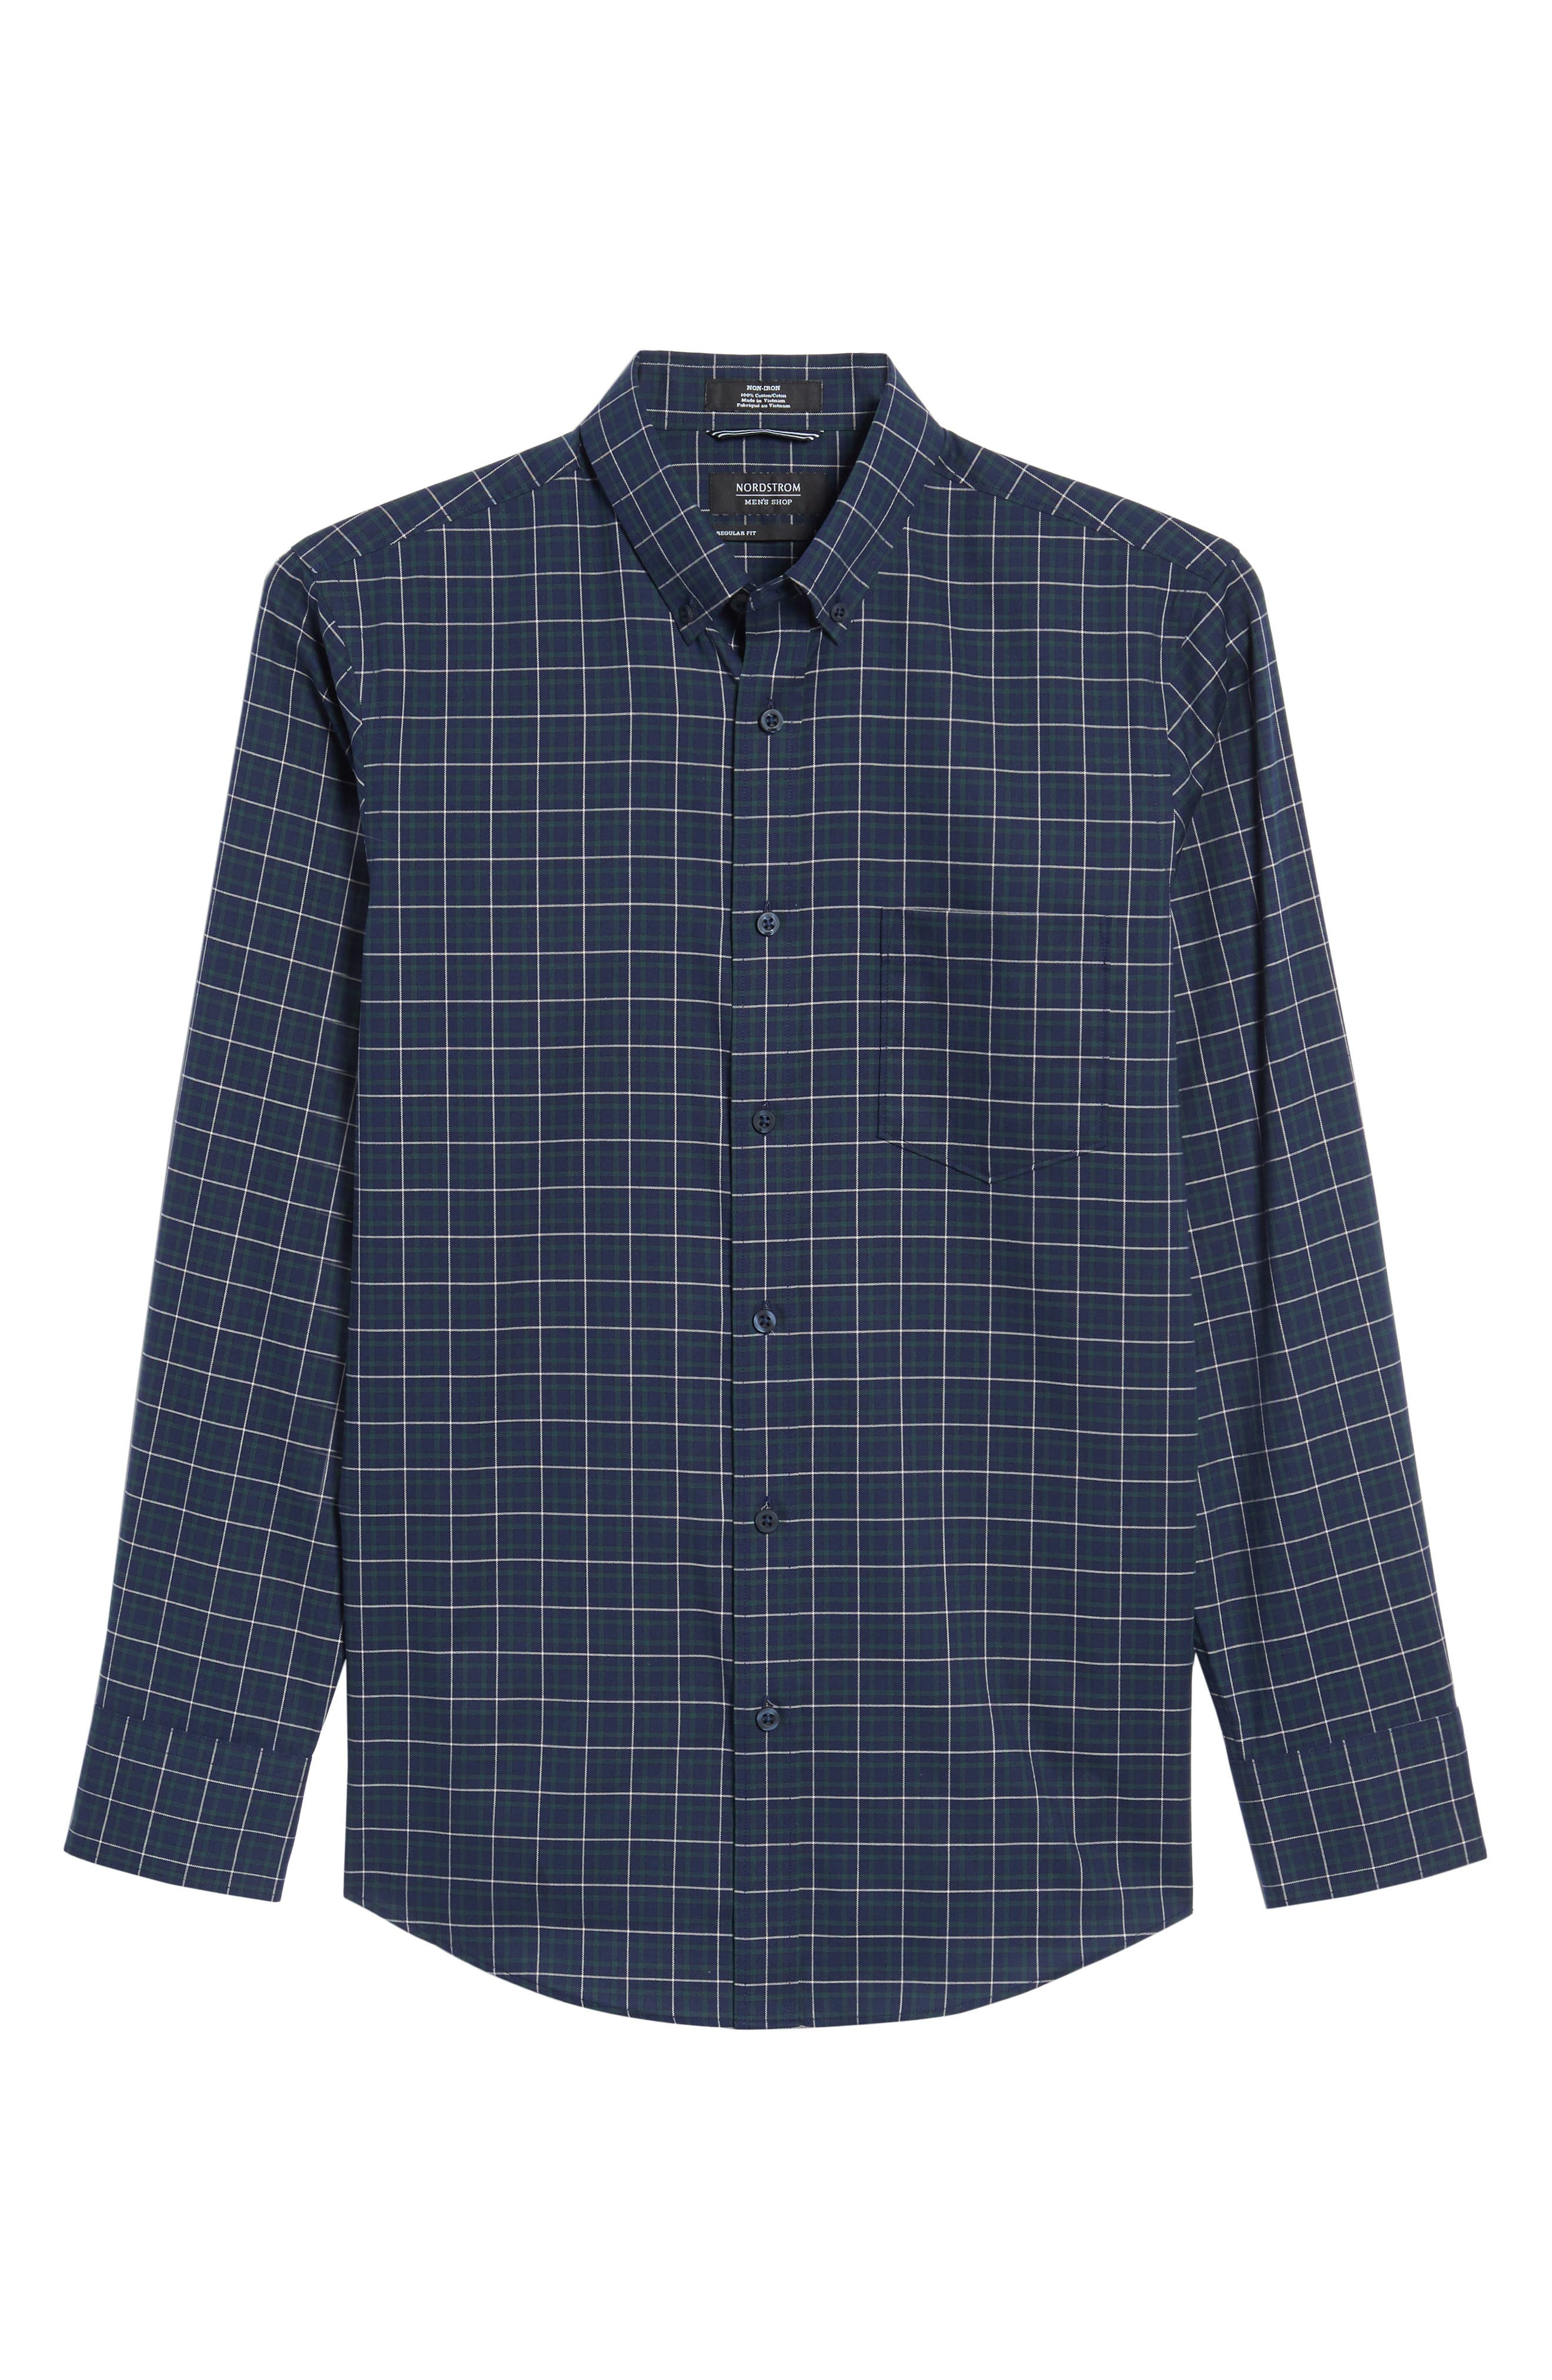 Regular Fit Non-Iron Plaid Sport Shirt,                             Alternate thumbnail 6, color,